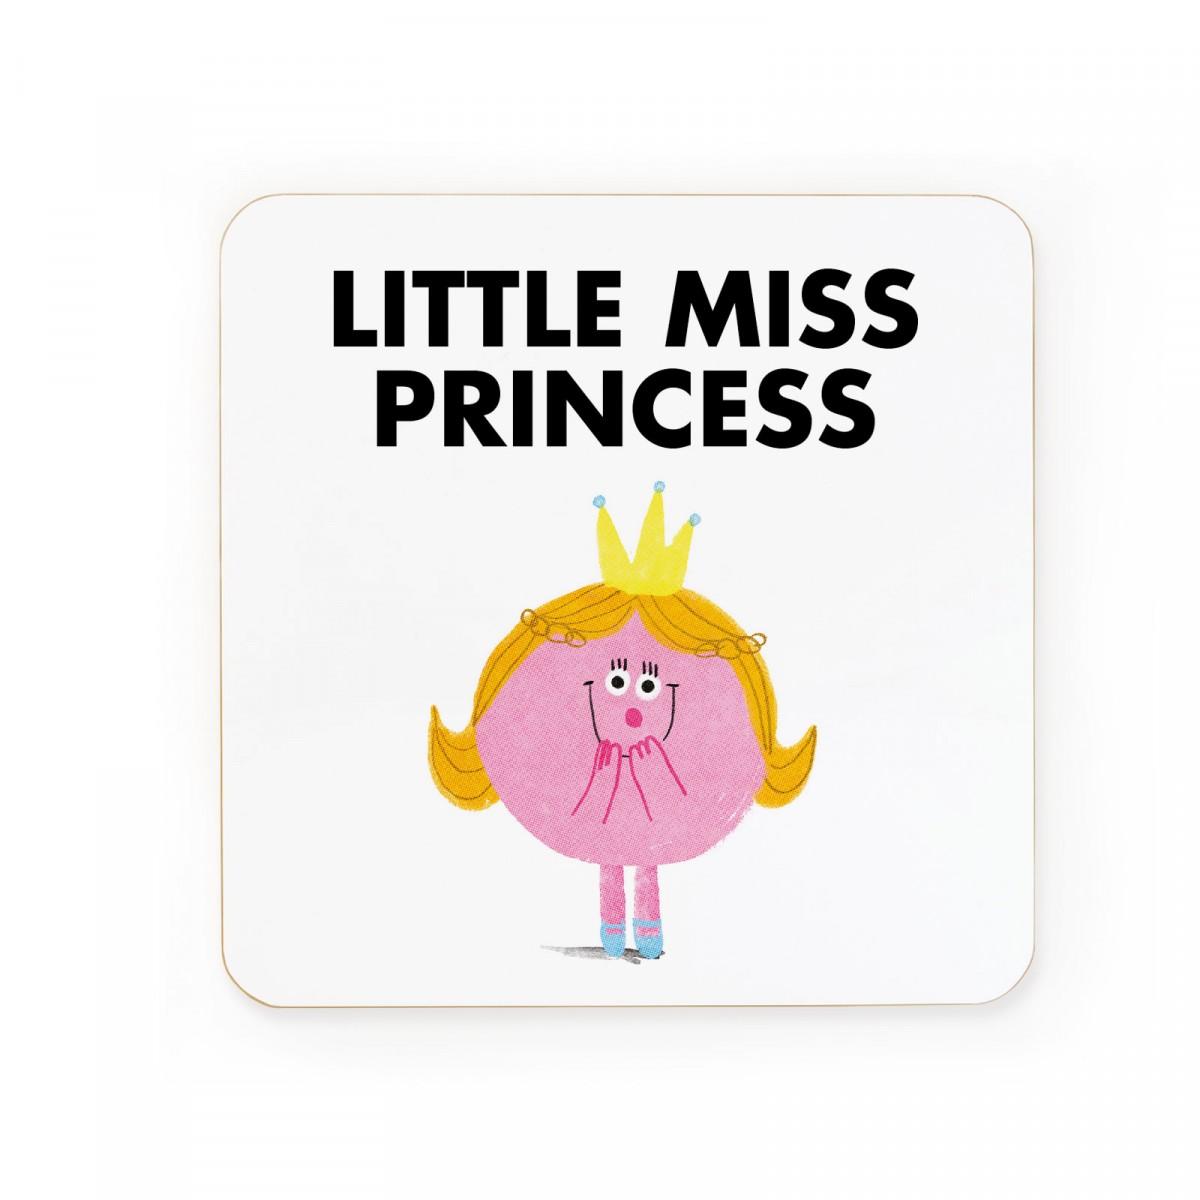 mmlm-co-013_little_miss_princess_coaster.jpg